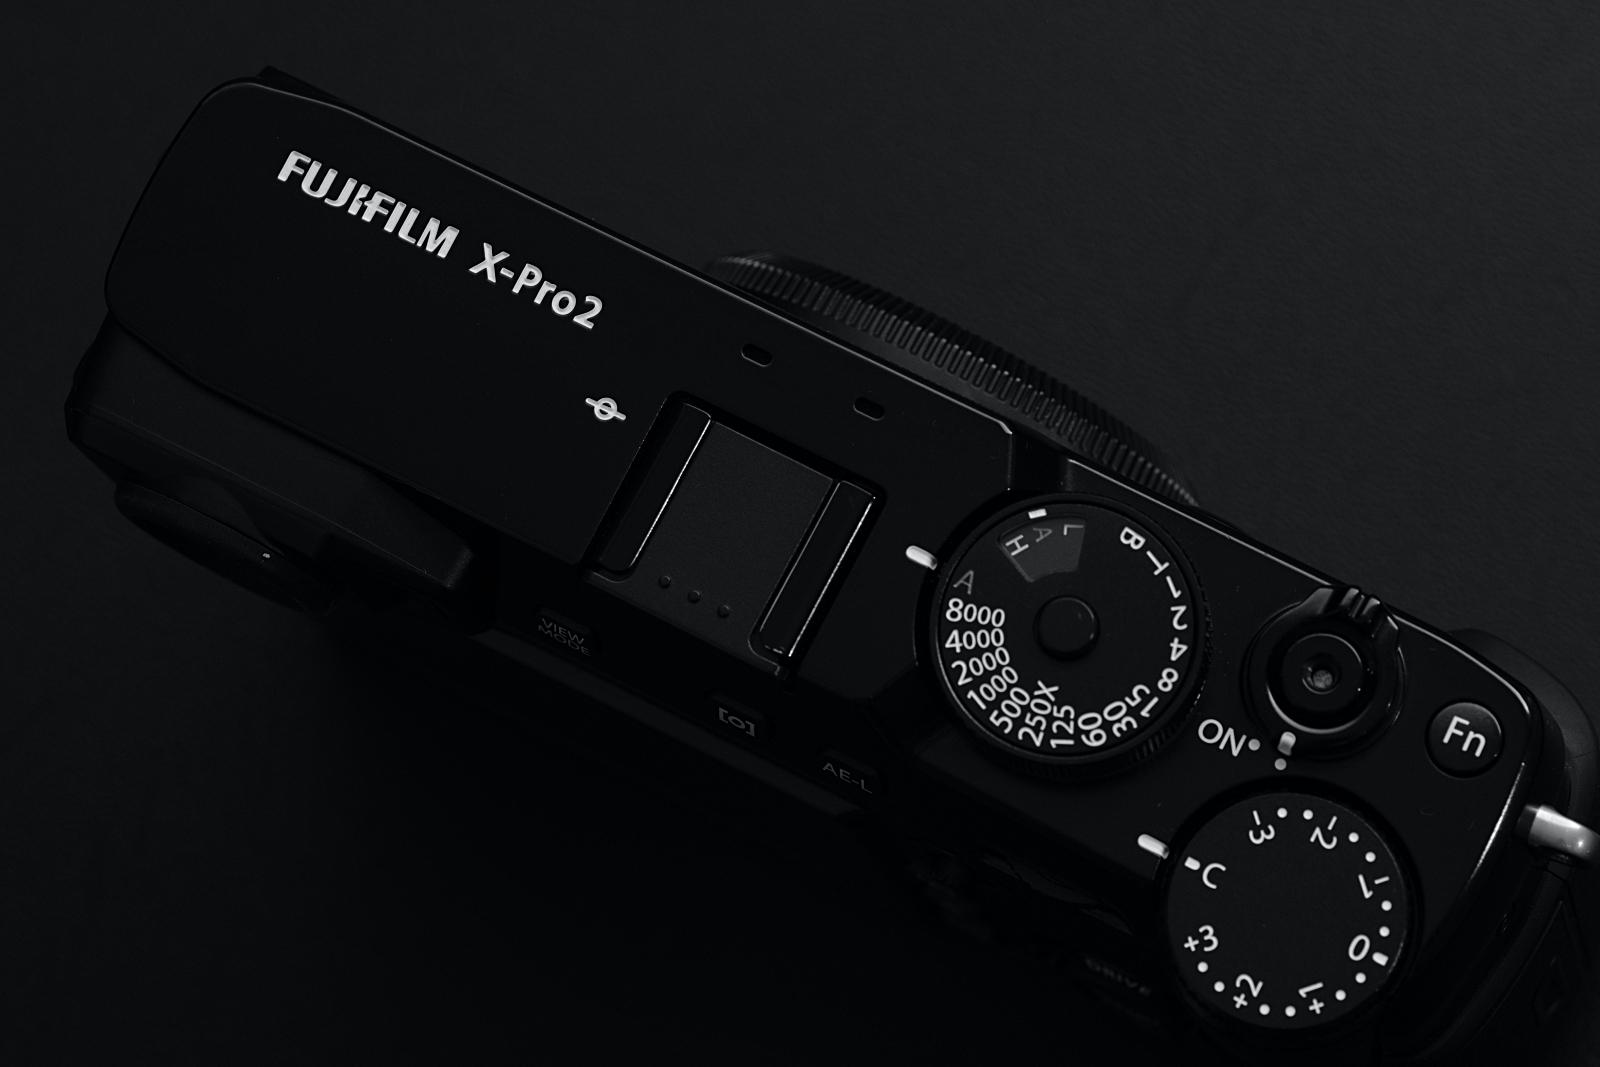 FUJIFILM X-Pro2_a0129474_22400906.jpg